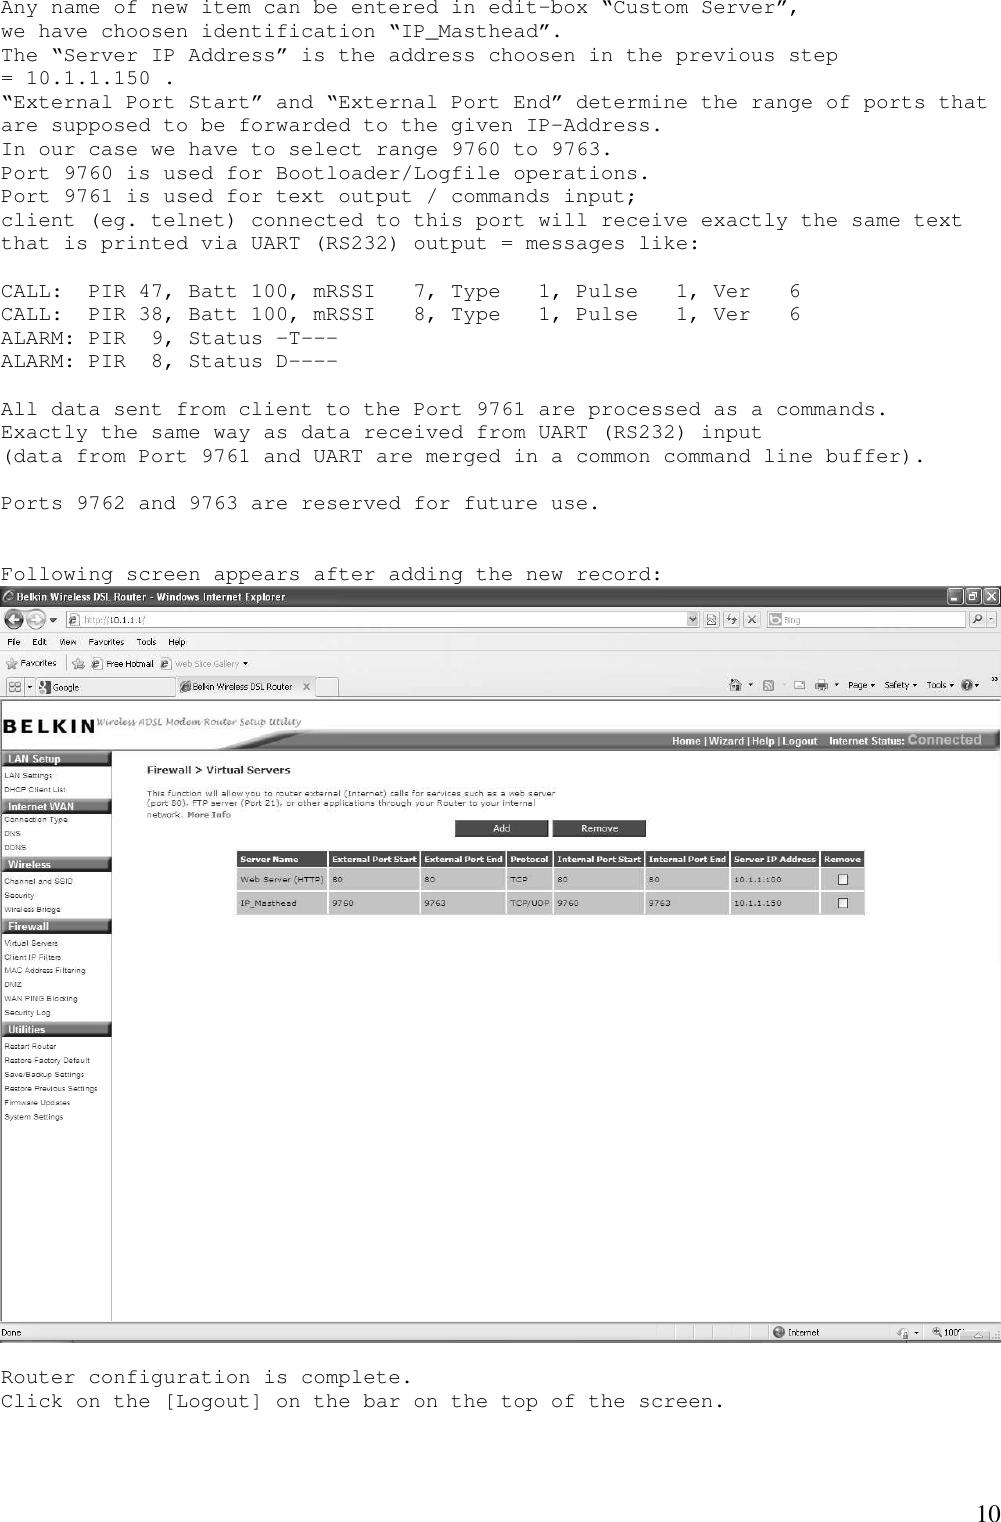 Lumlgmt434 IP Masthead_configuration User Manual